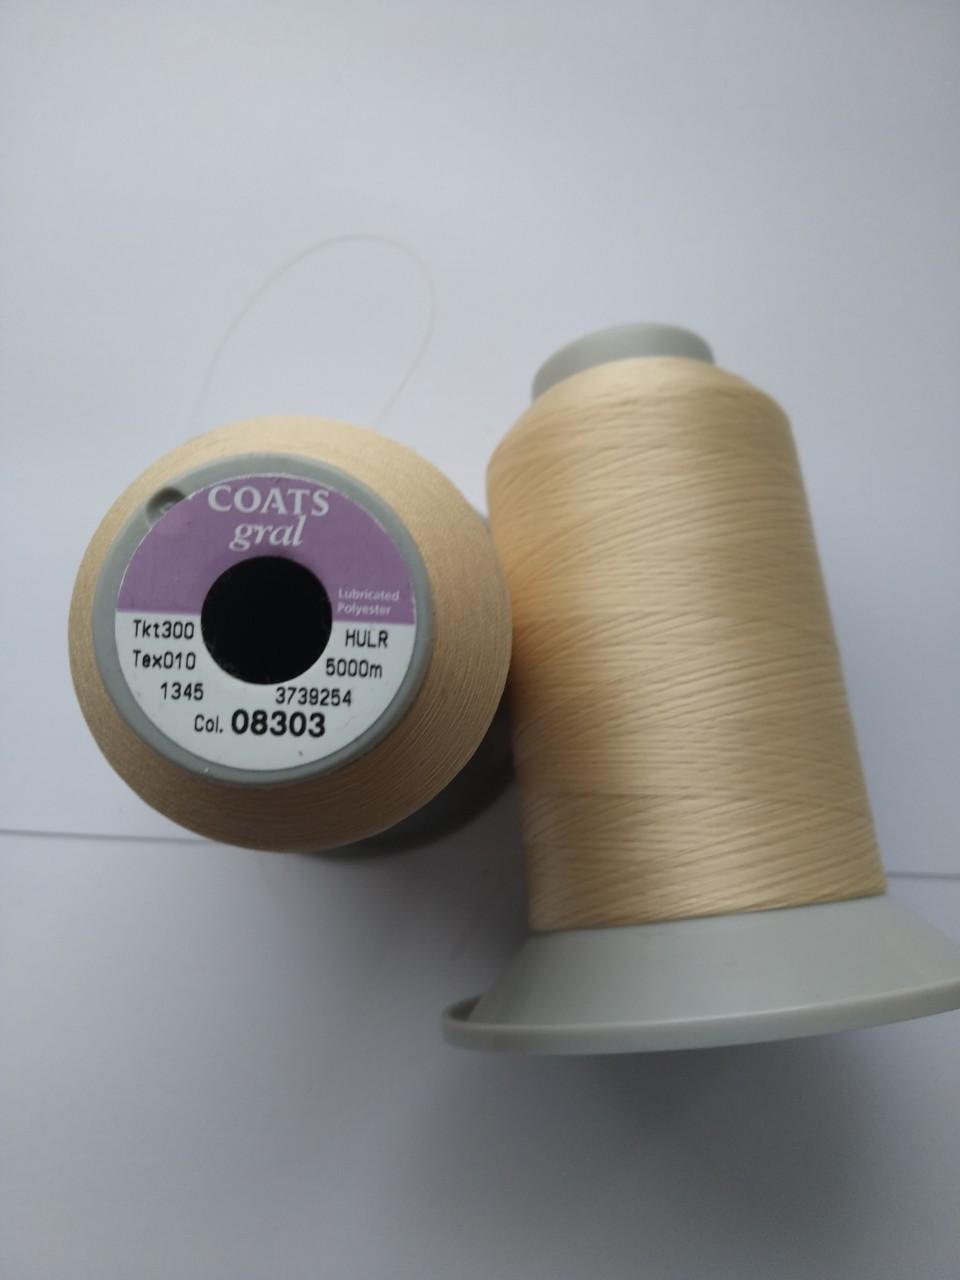 Нитки Coats gral 08303 / 300 / 5000м